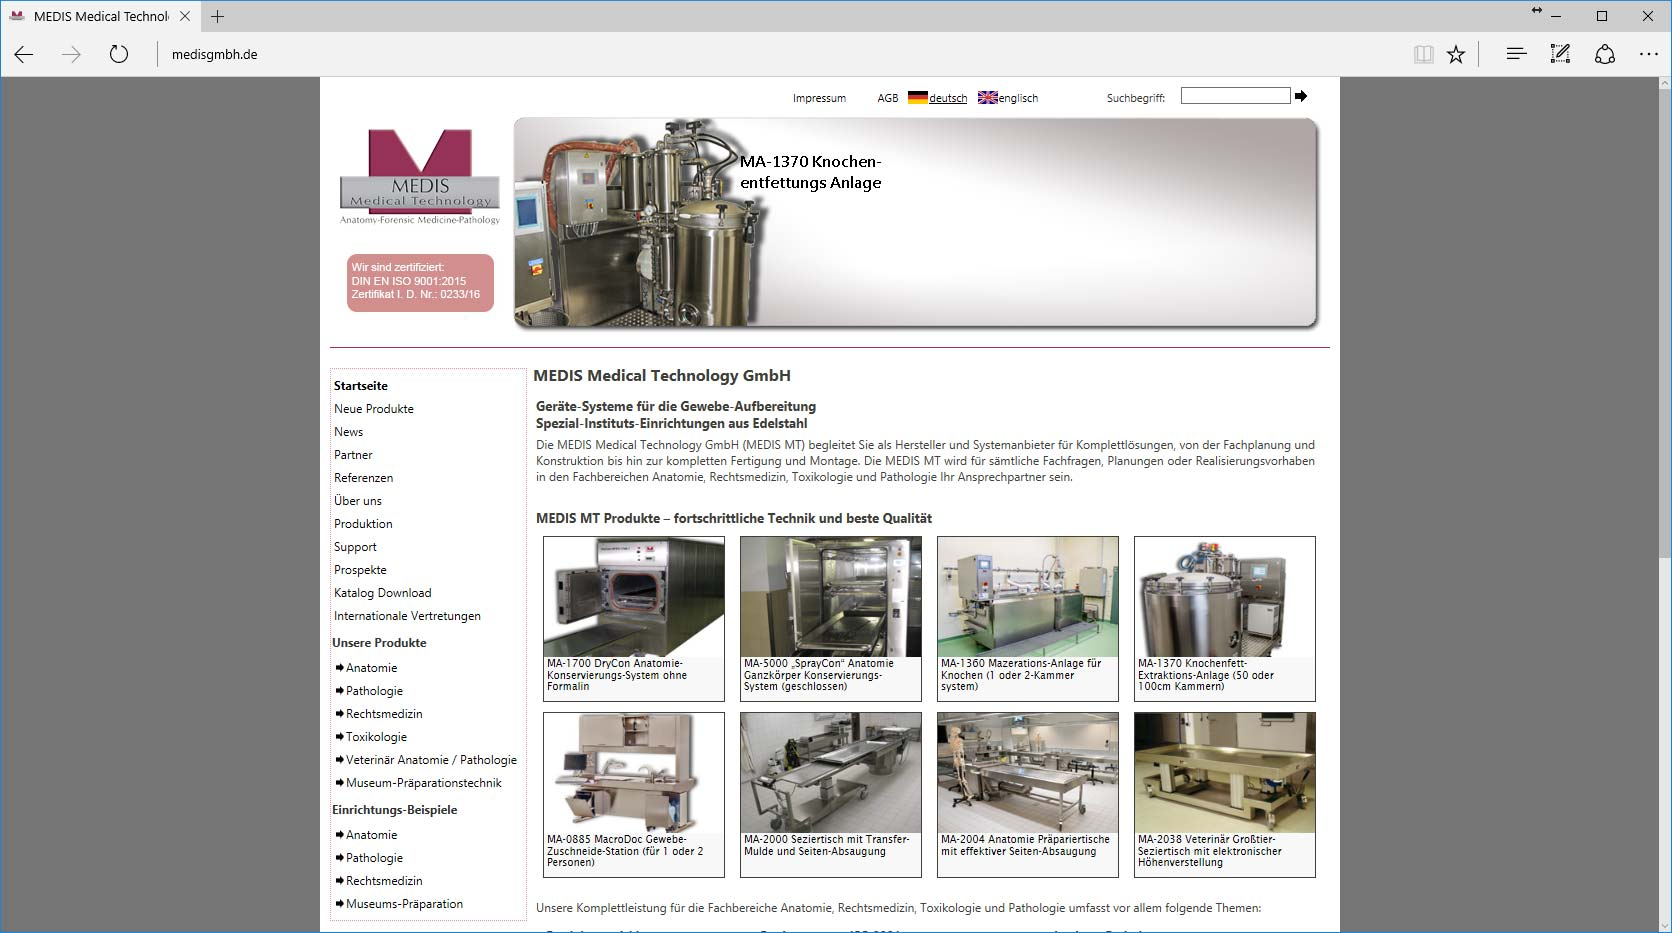 MEDIS GmbH